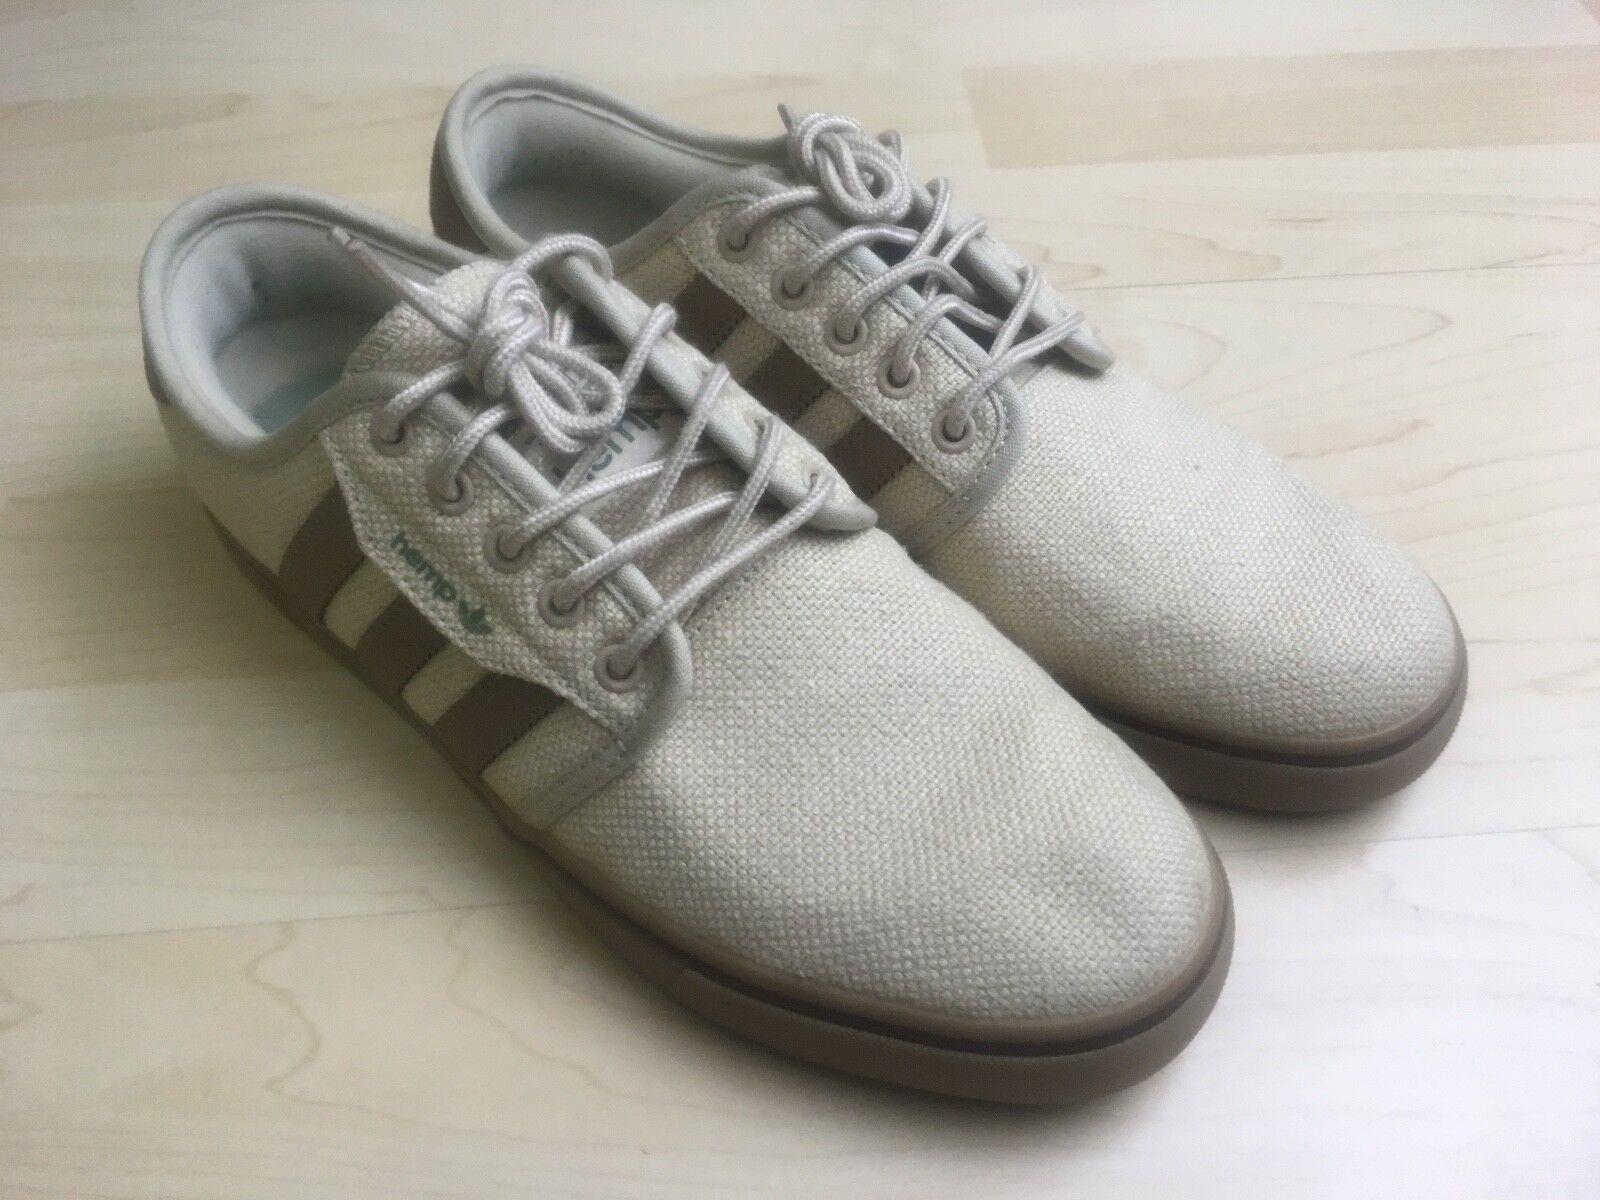 Adidas HEMP Men's Shoe Low Size US 7.5 FR 20 2/3 JP 255 CHN 250 TAN BROWN